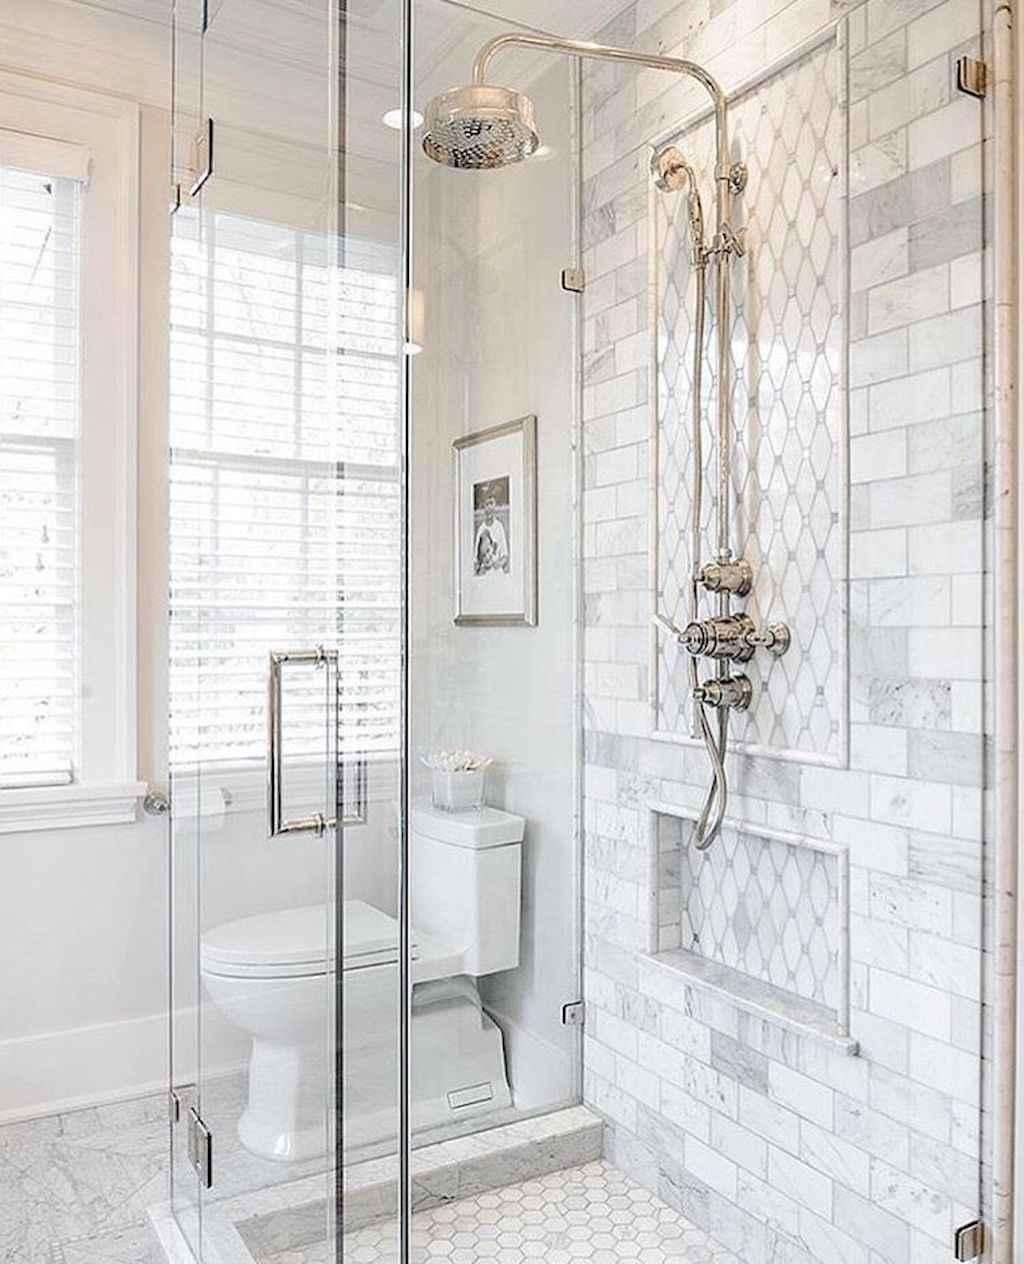 120 Stunning Bathroom Tile Shower Ideas (111) - CoachDecor.com